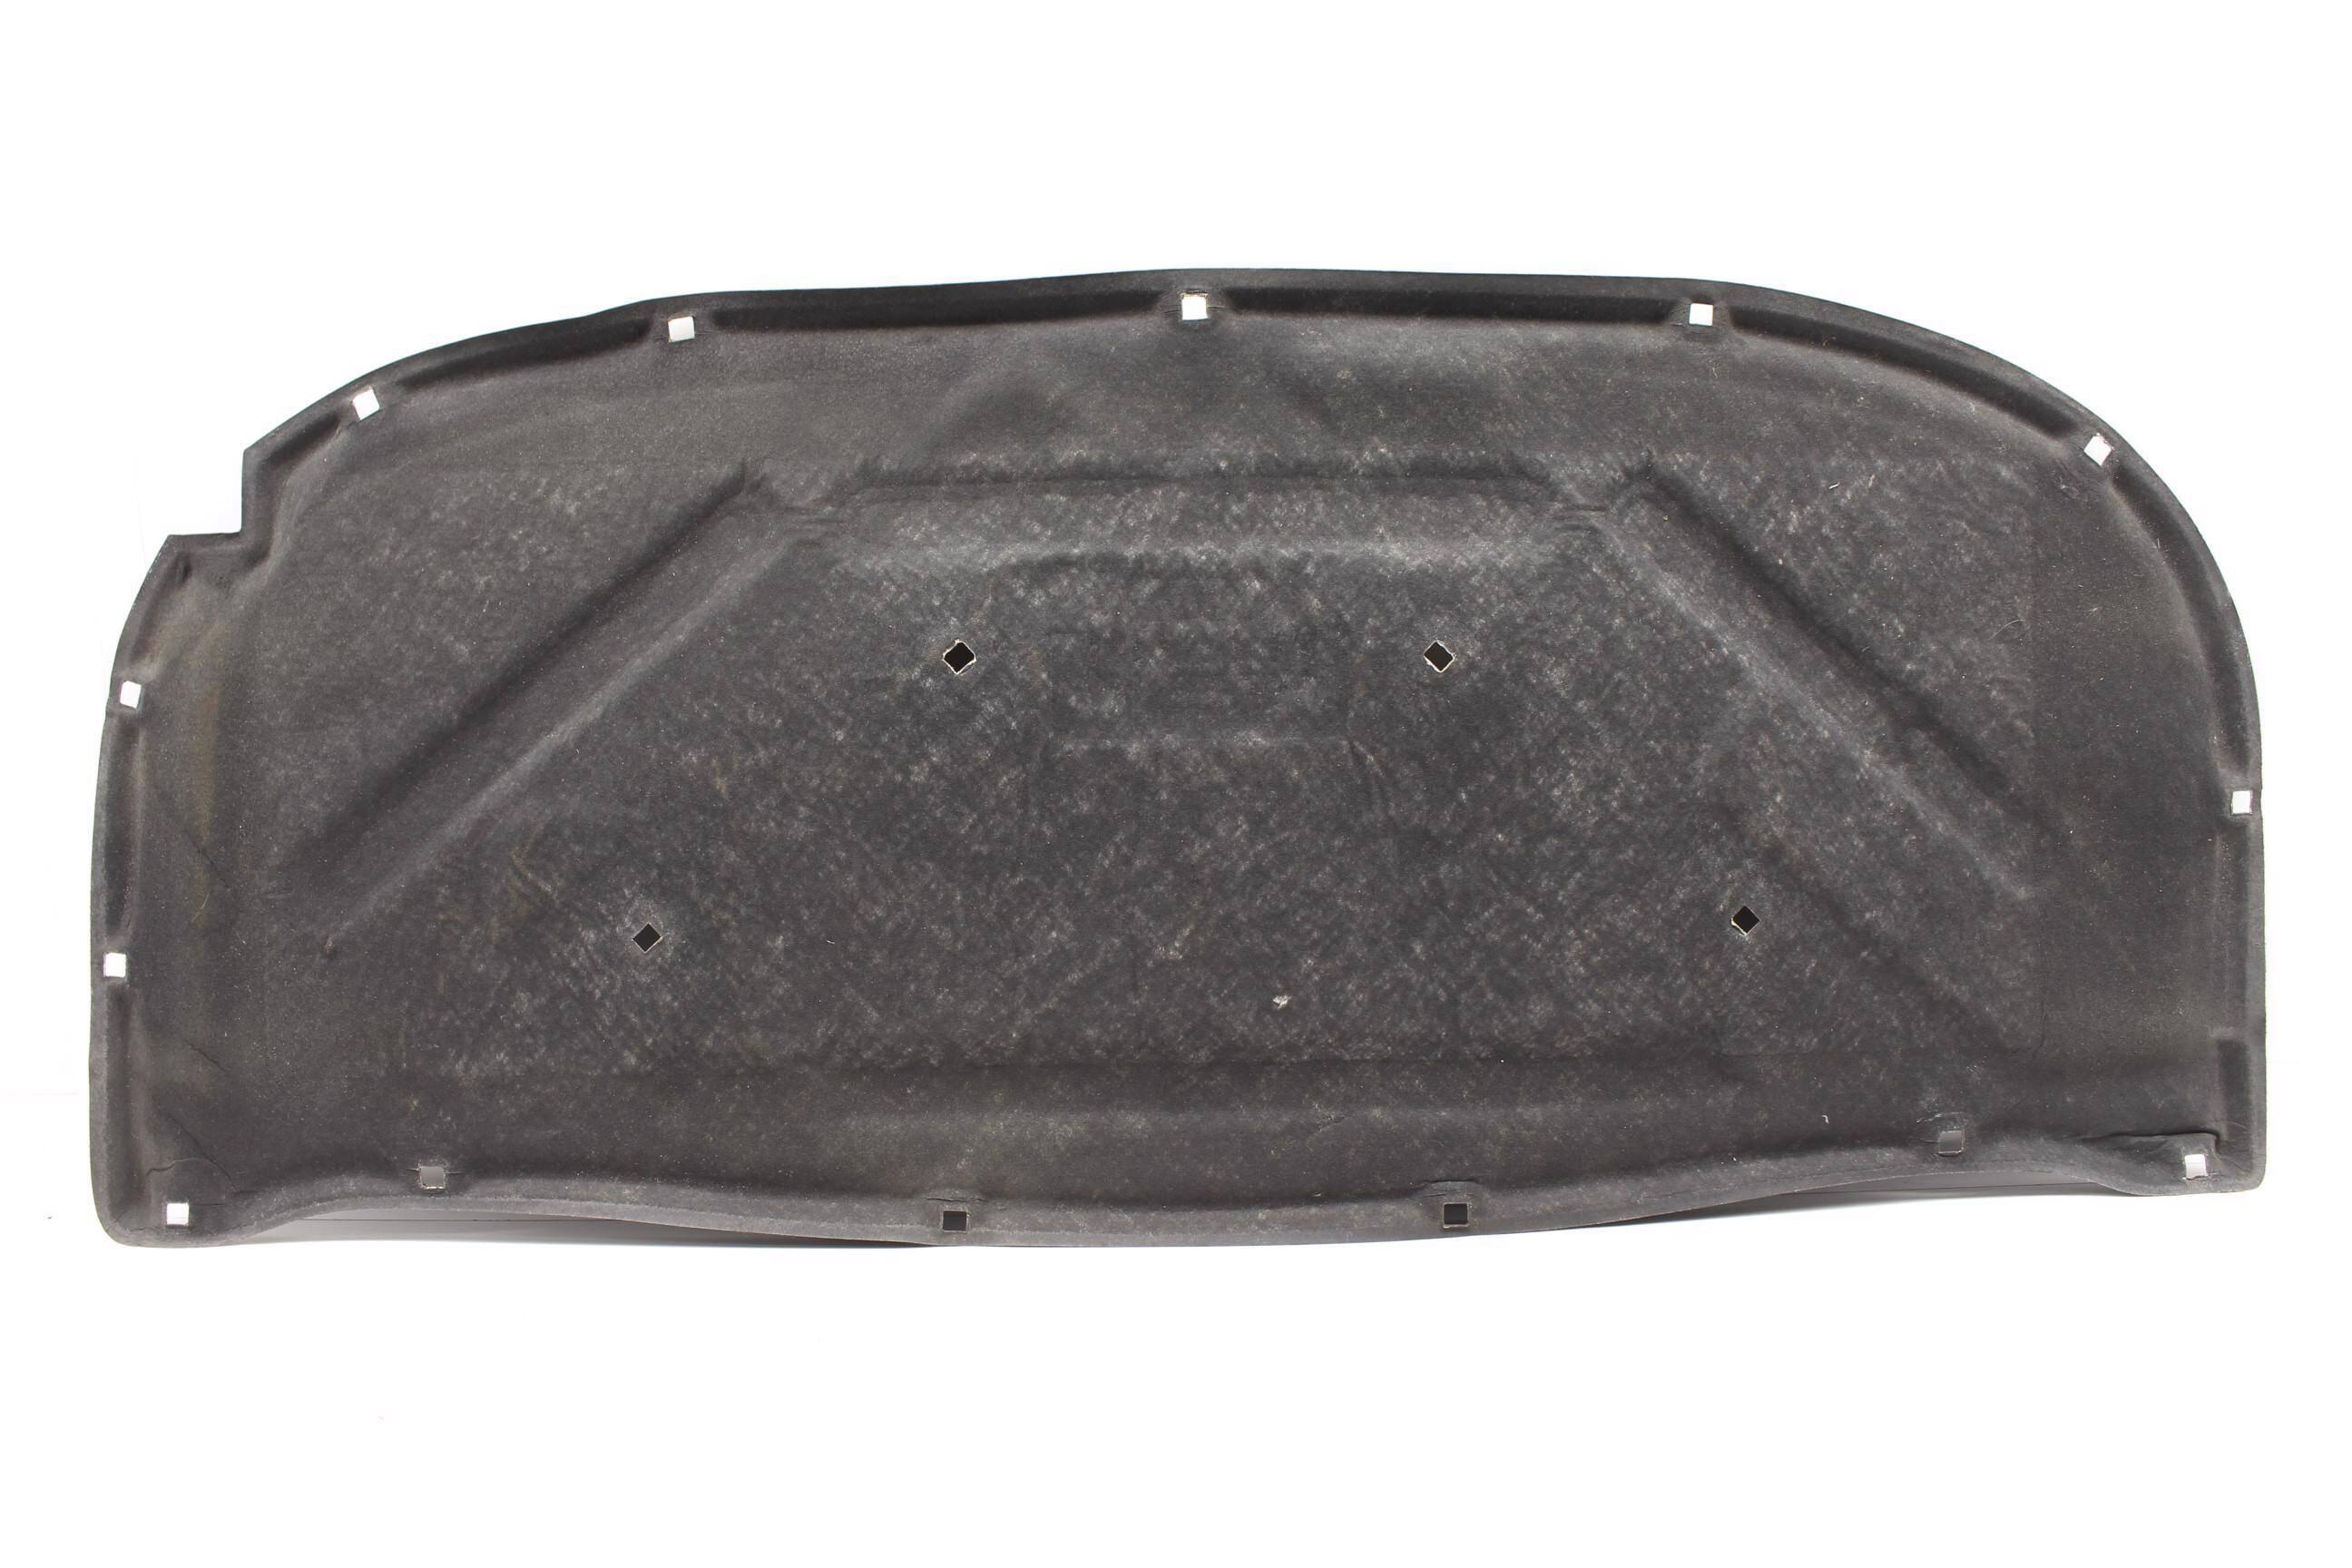 For 1999-2005 Volkswagen Jetta Hood Insulation Pad 33173FK 2002 2000 2003 2004